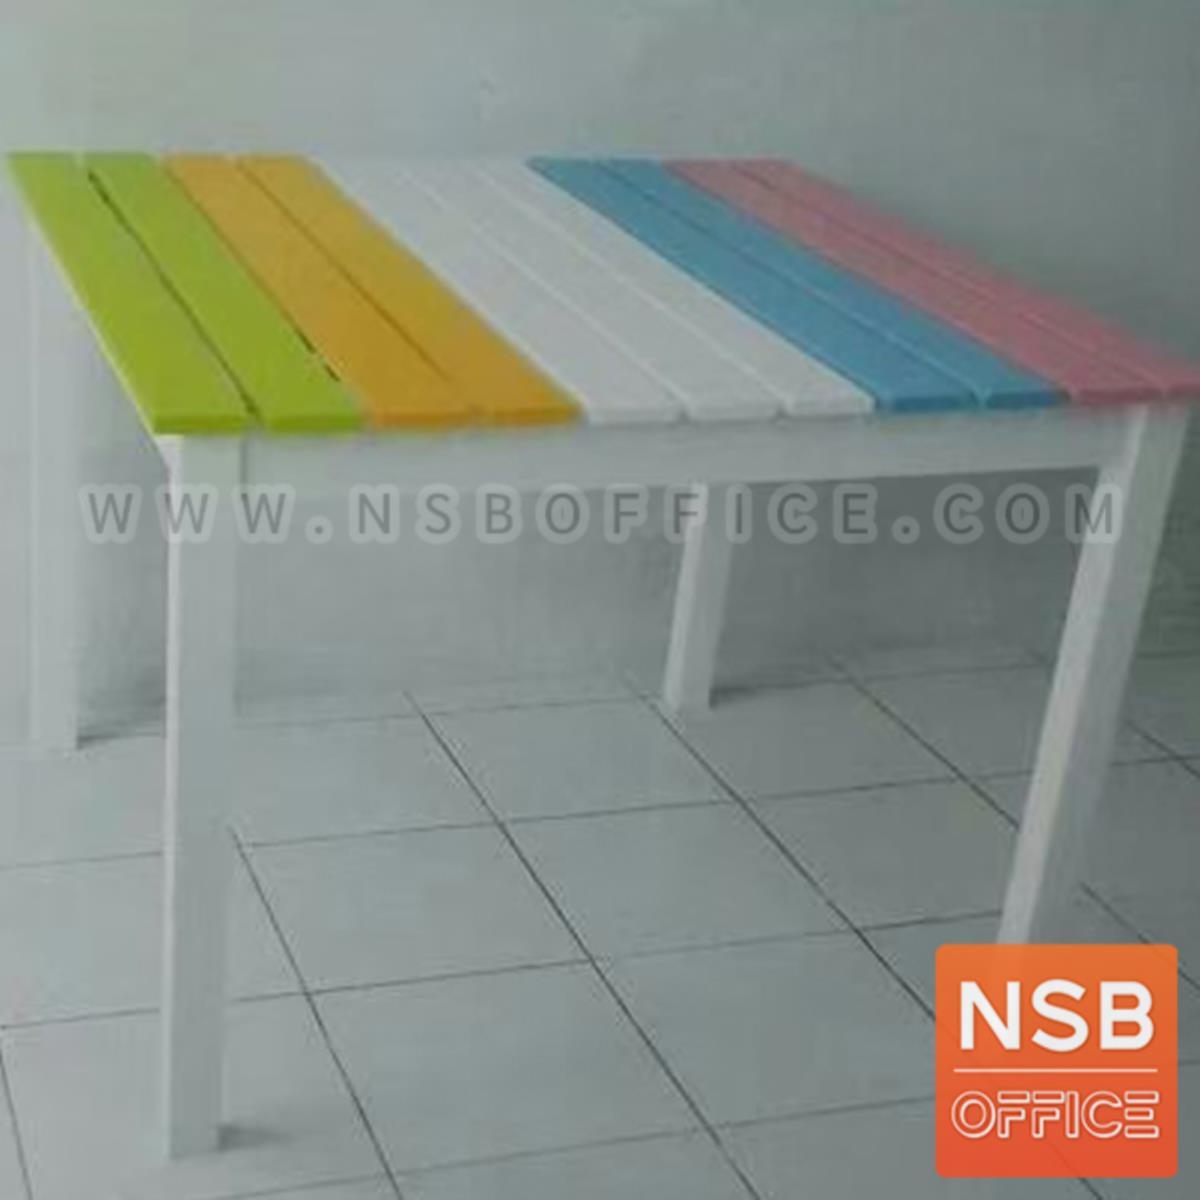 G20A022:โต๊ะสนามไม้ รุ่น Dacian (ดาเชียน)  ขนาด 90Di*75H cm.